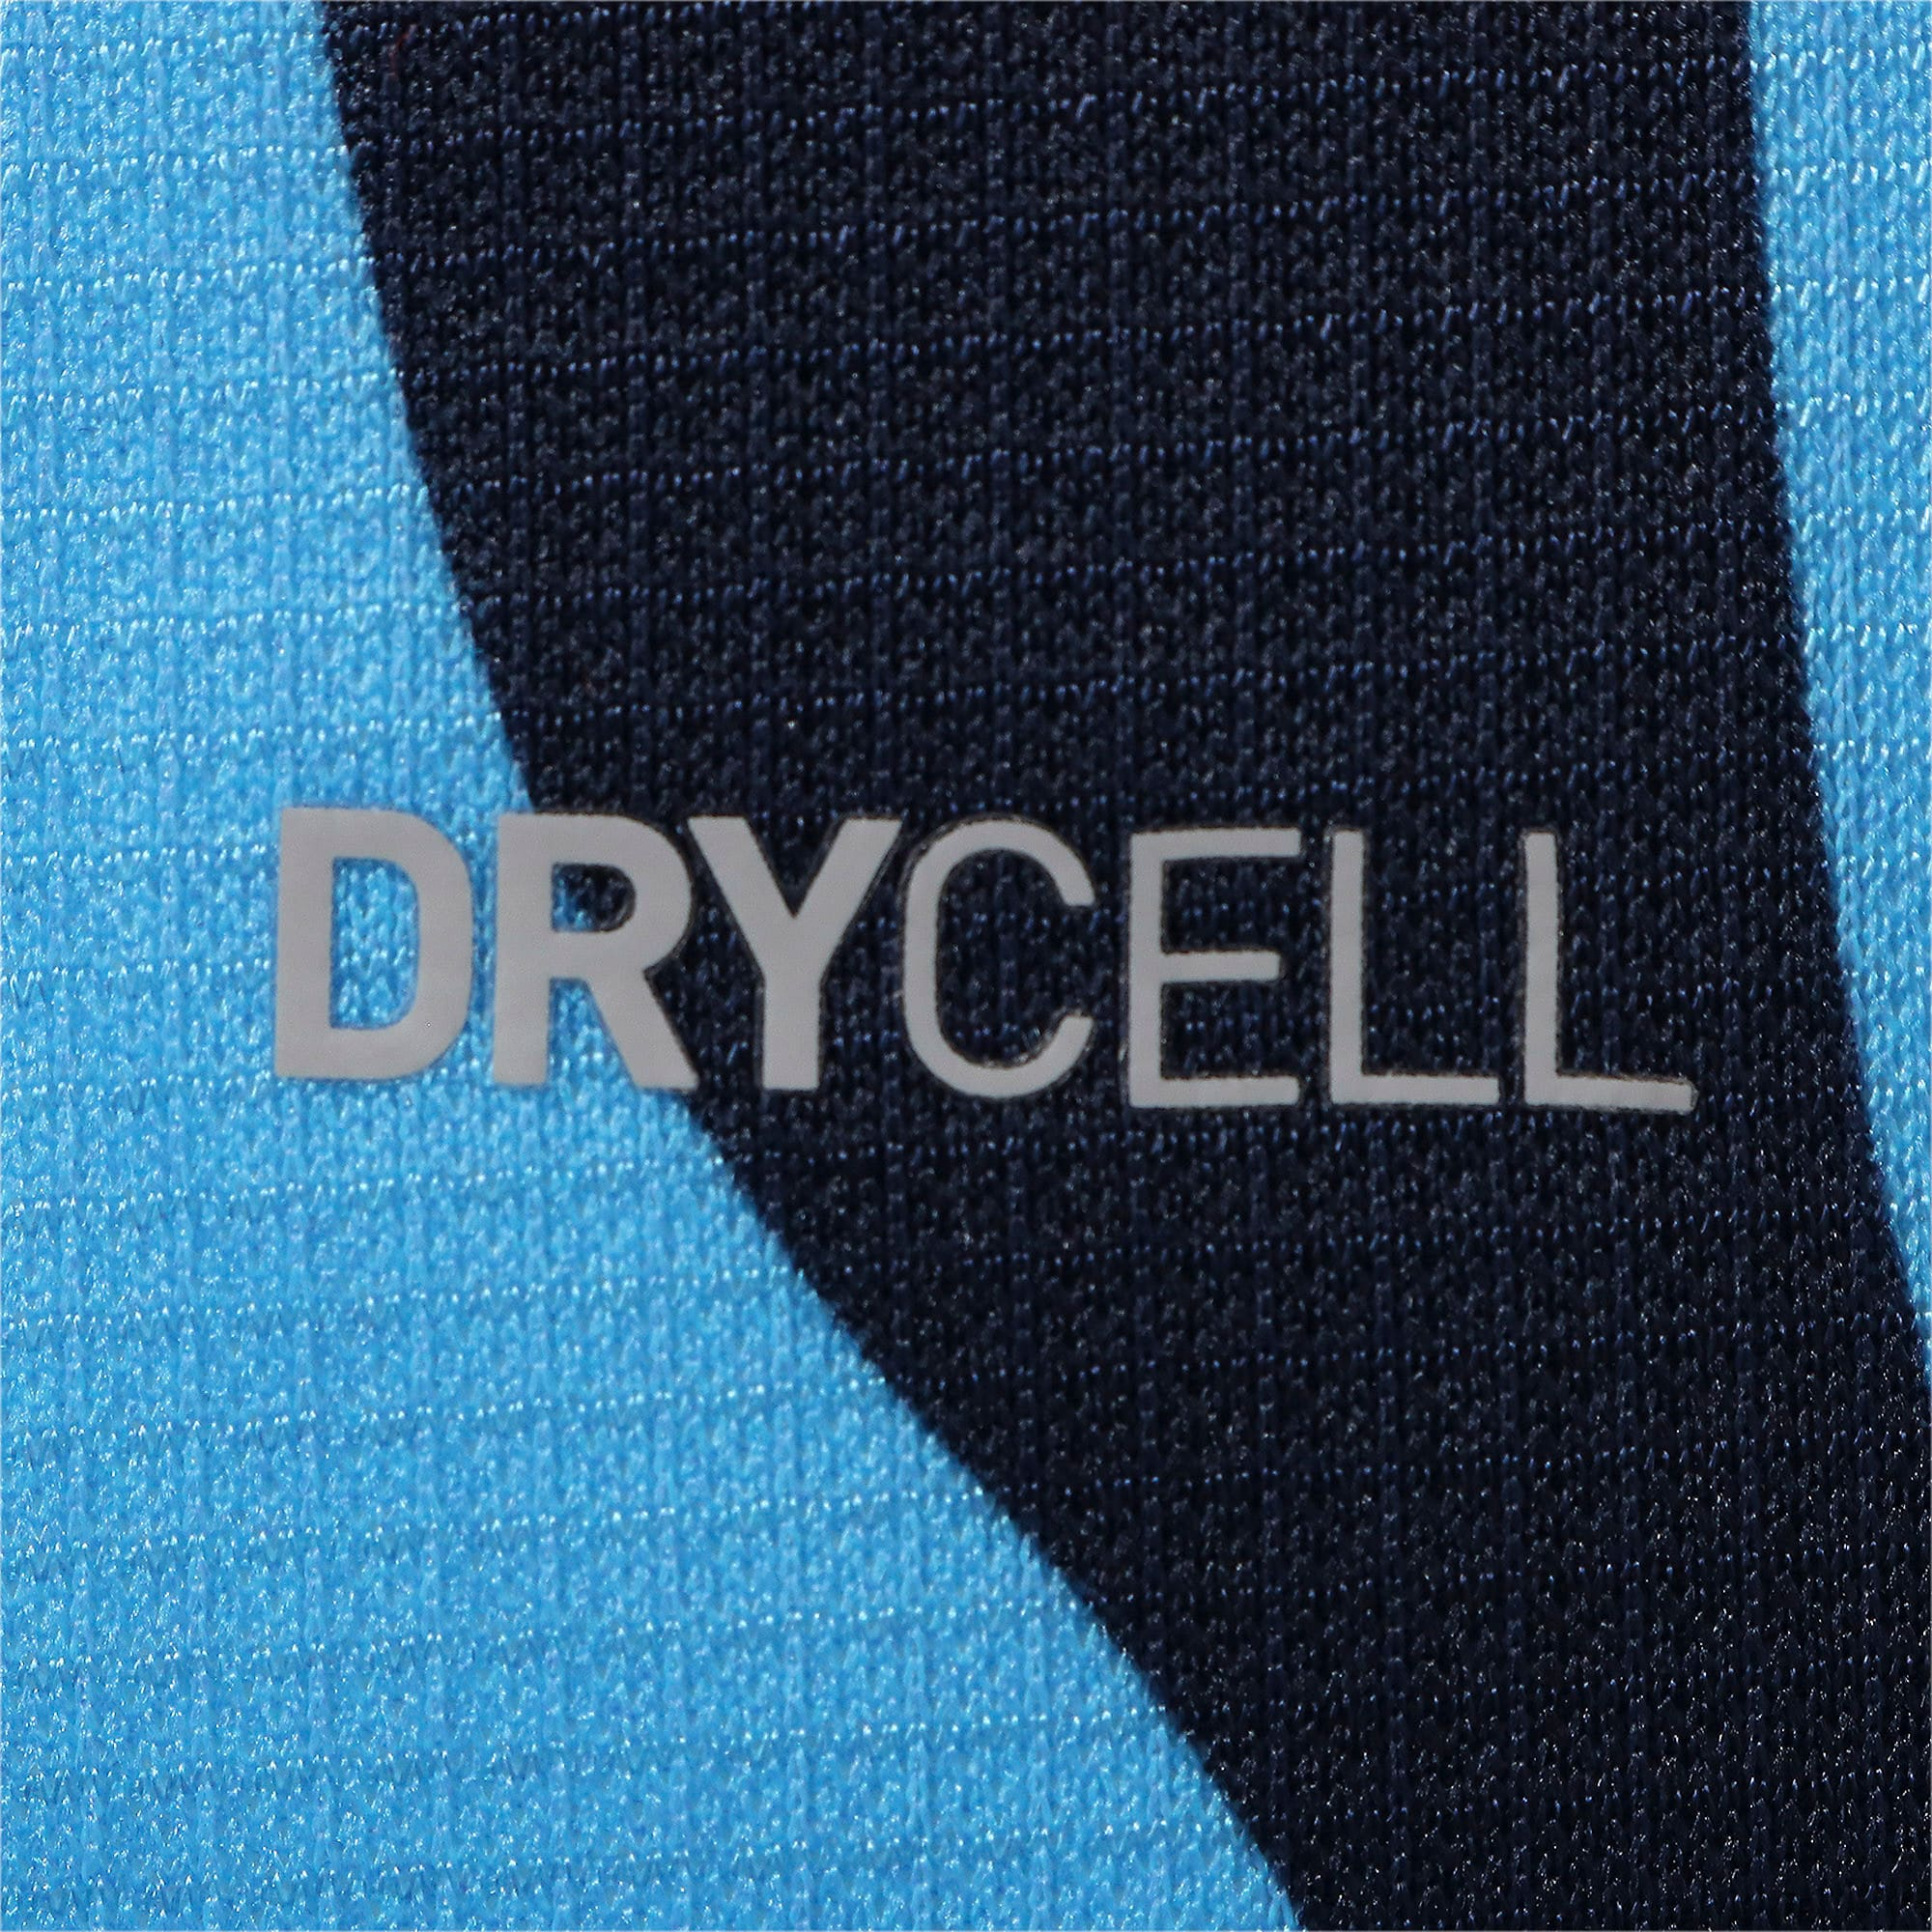 Thumbnail 9 of ジュビロ 19 リミテッド ハンソデゲームシャツ ユニフォーム, AZURE BLUE-Peacoat, medium-JPN